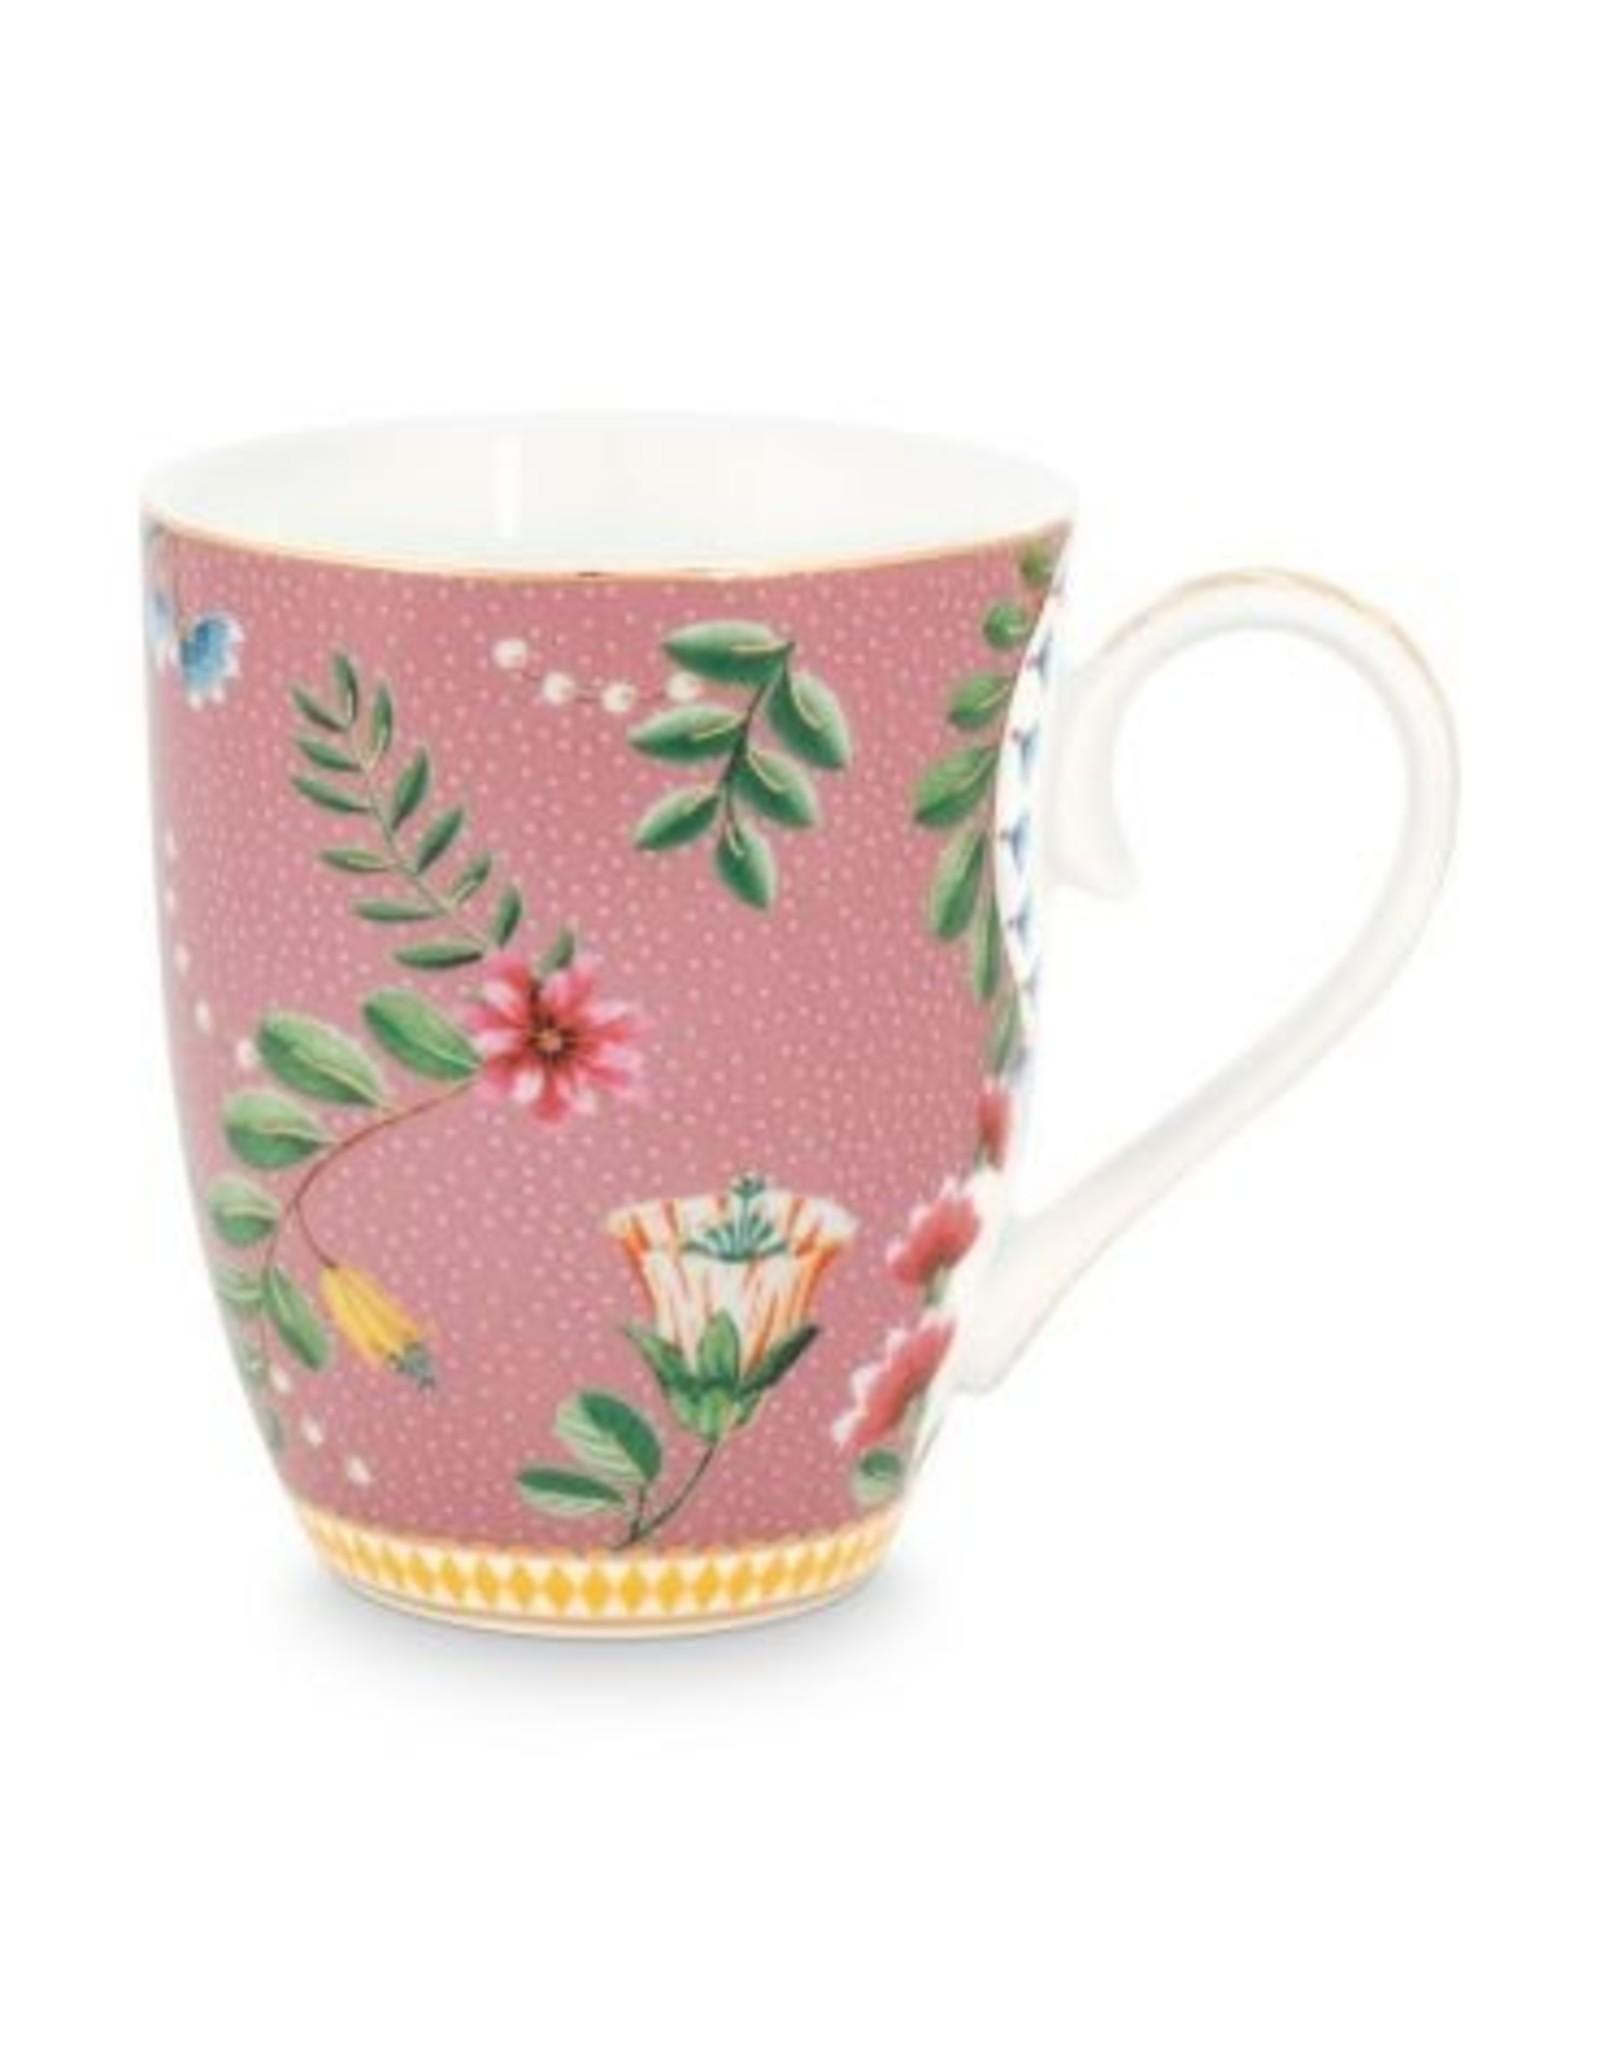 Pip Studio Pip Studio La Majorelle Tasse groß rosa